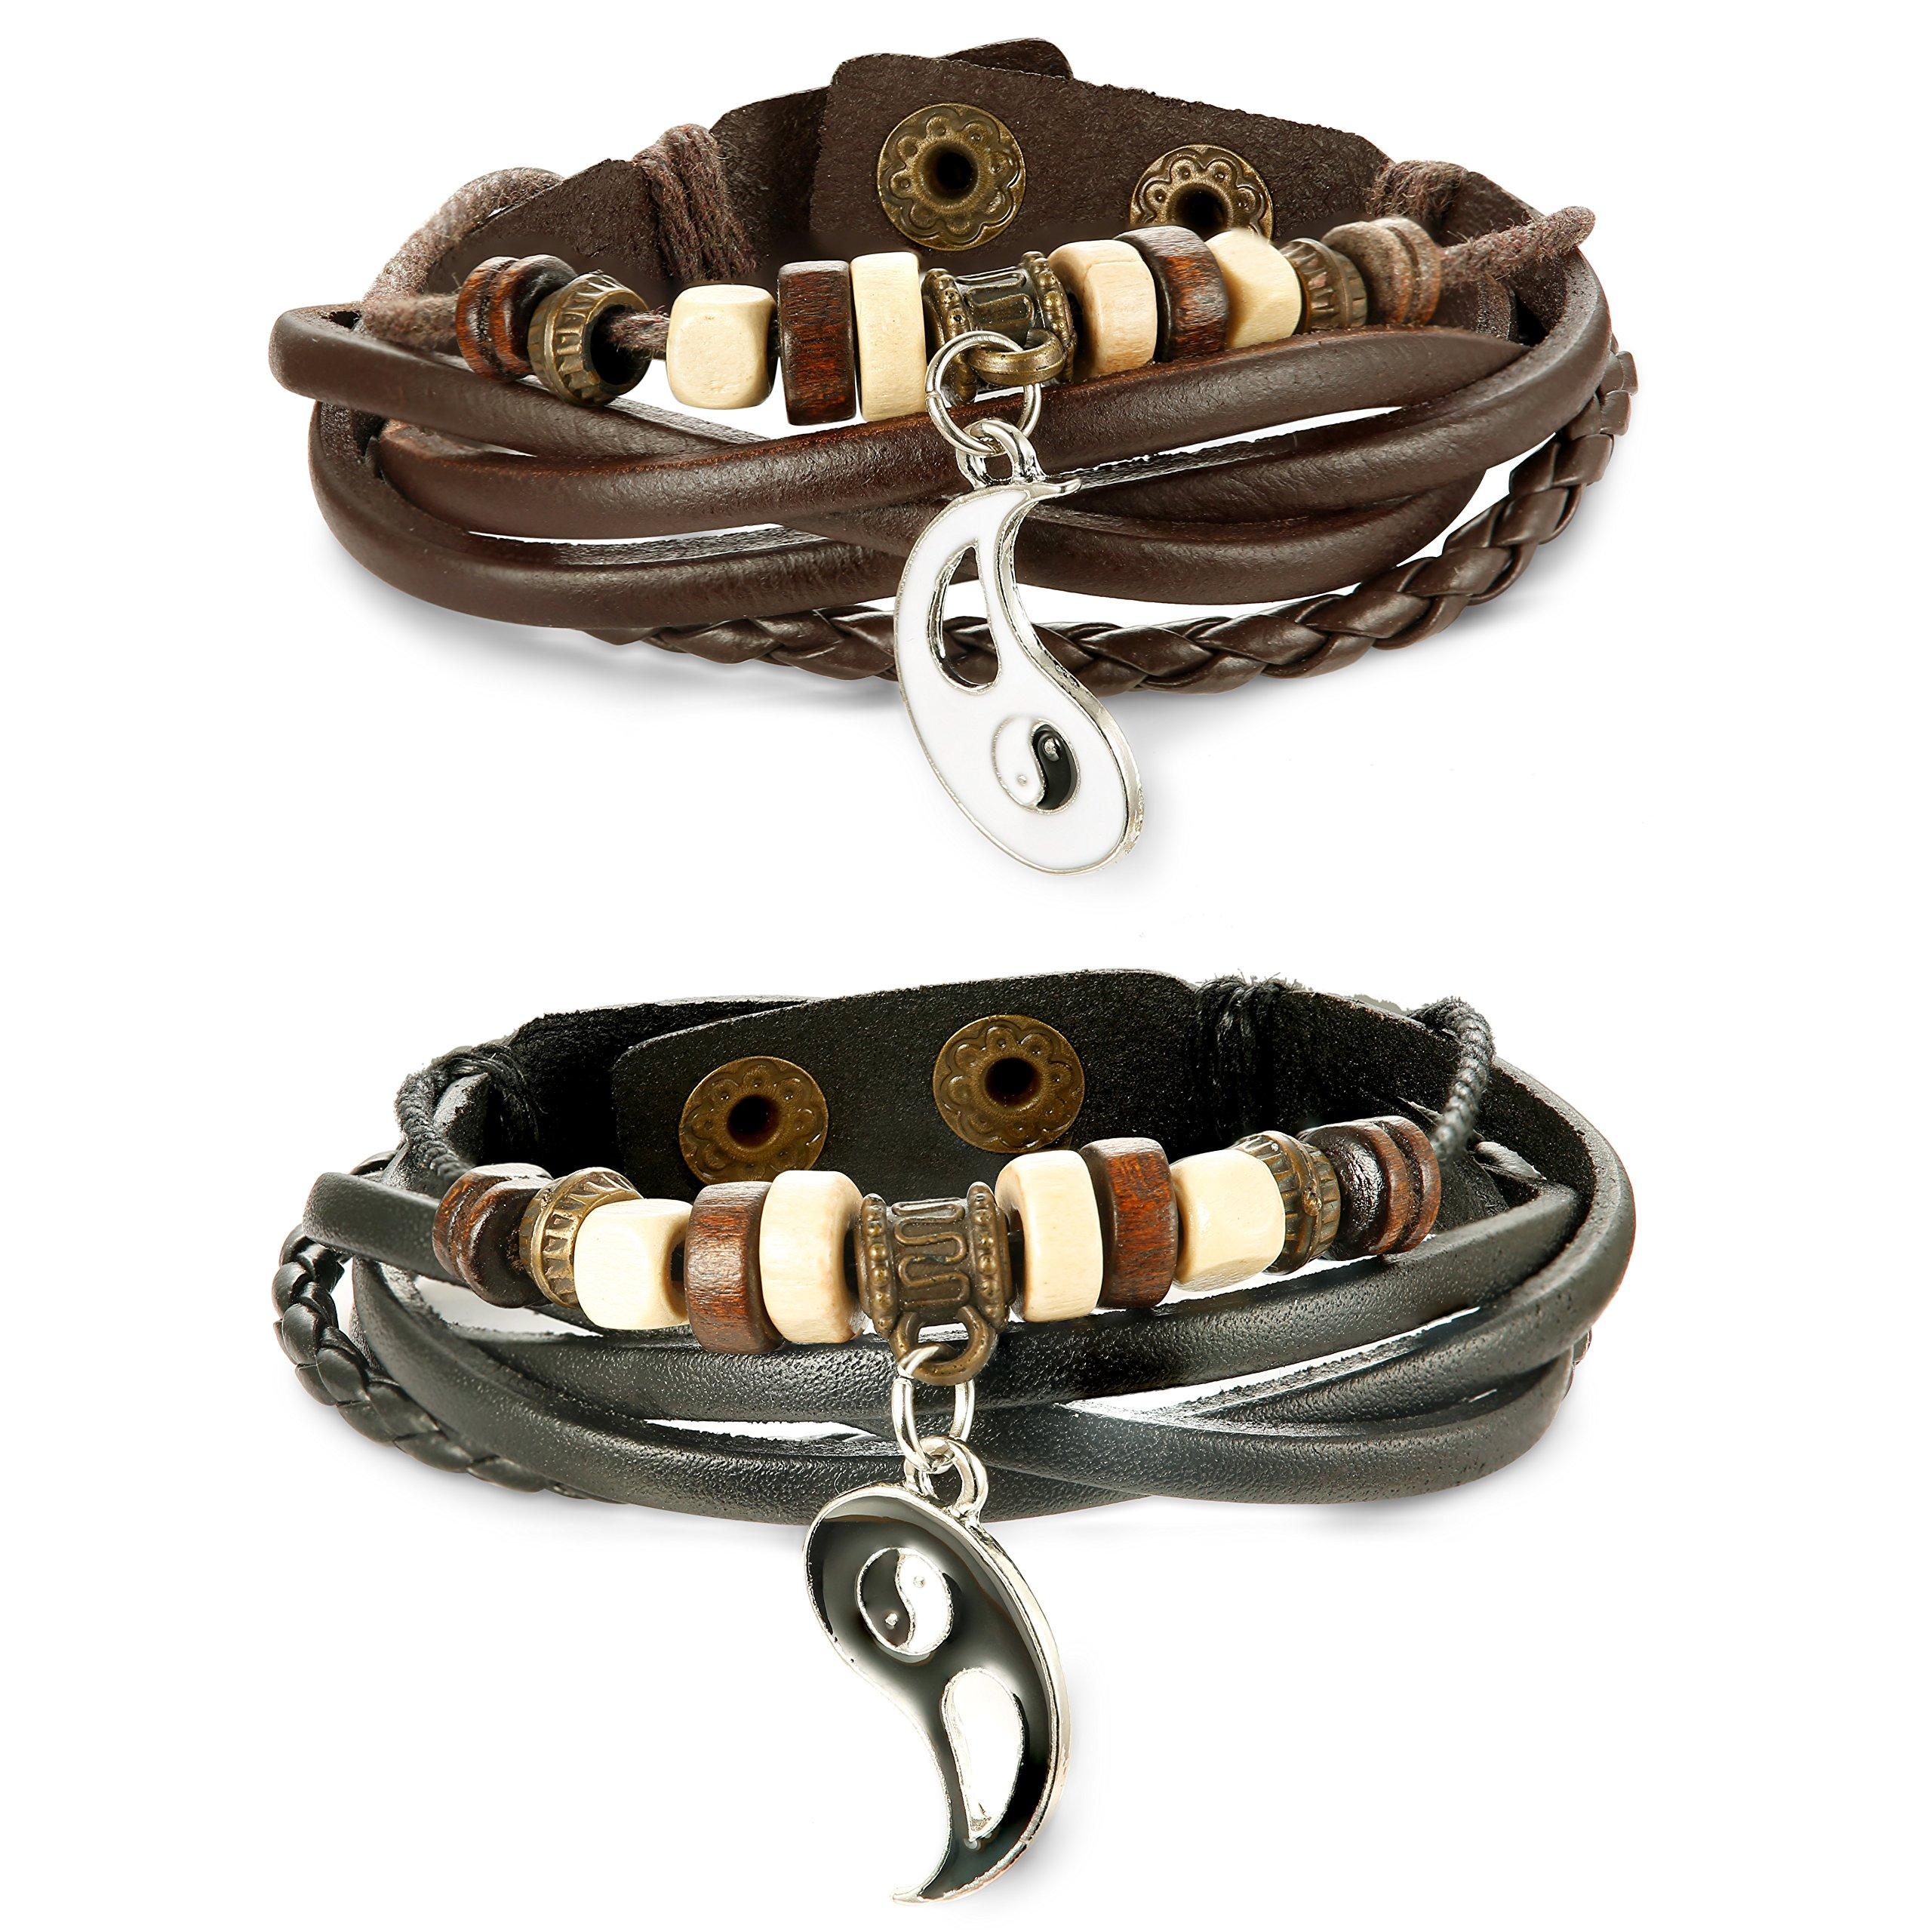 Jstyle Yin Yang Couples Necklace Bracelets for Women Mens Distance Leather Beaded Bracelet Adjustable 3Sets by Jstyle (Image #3)